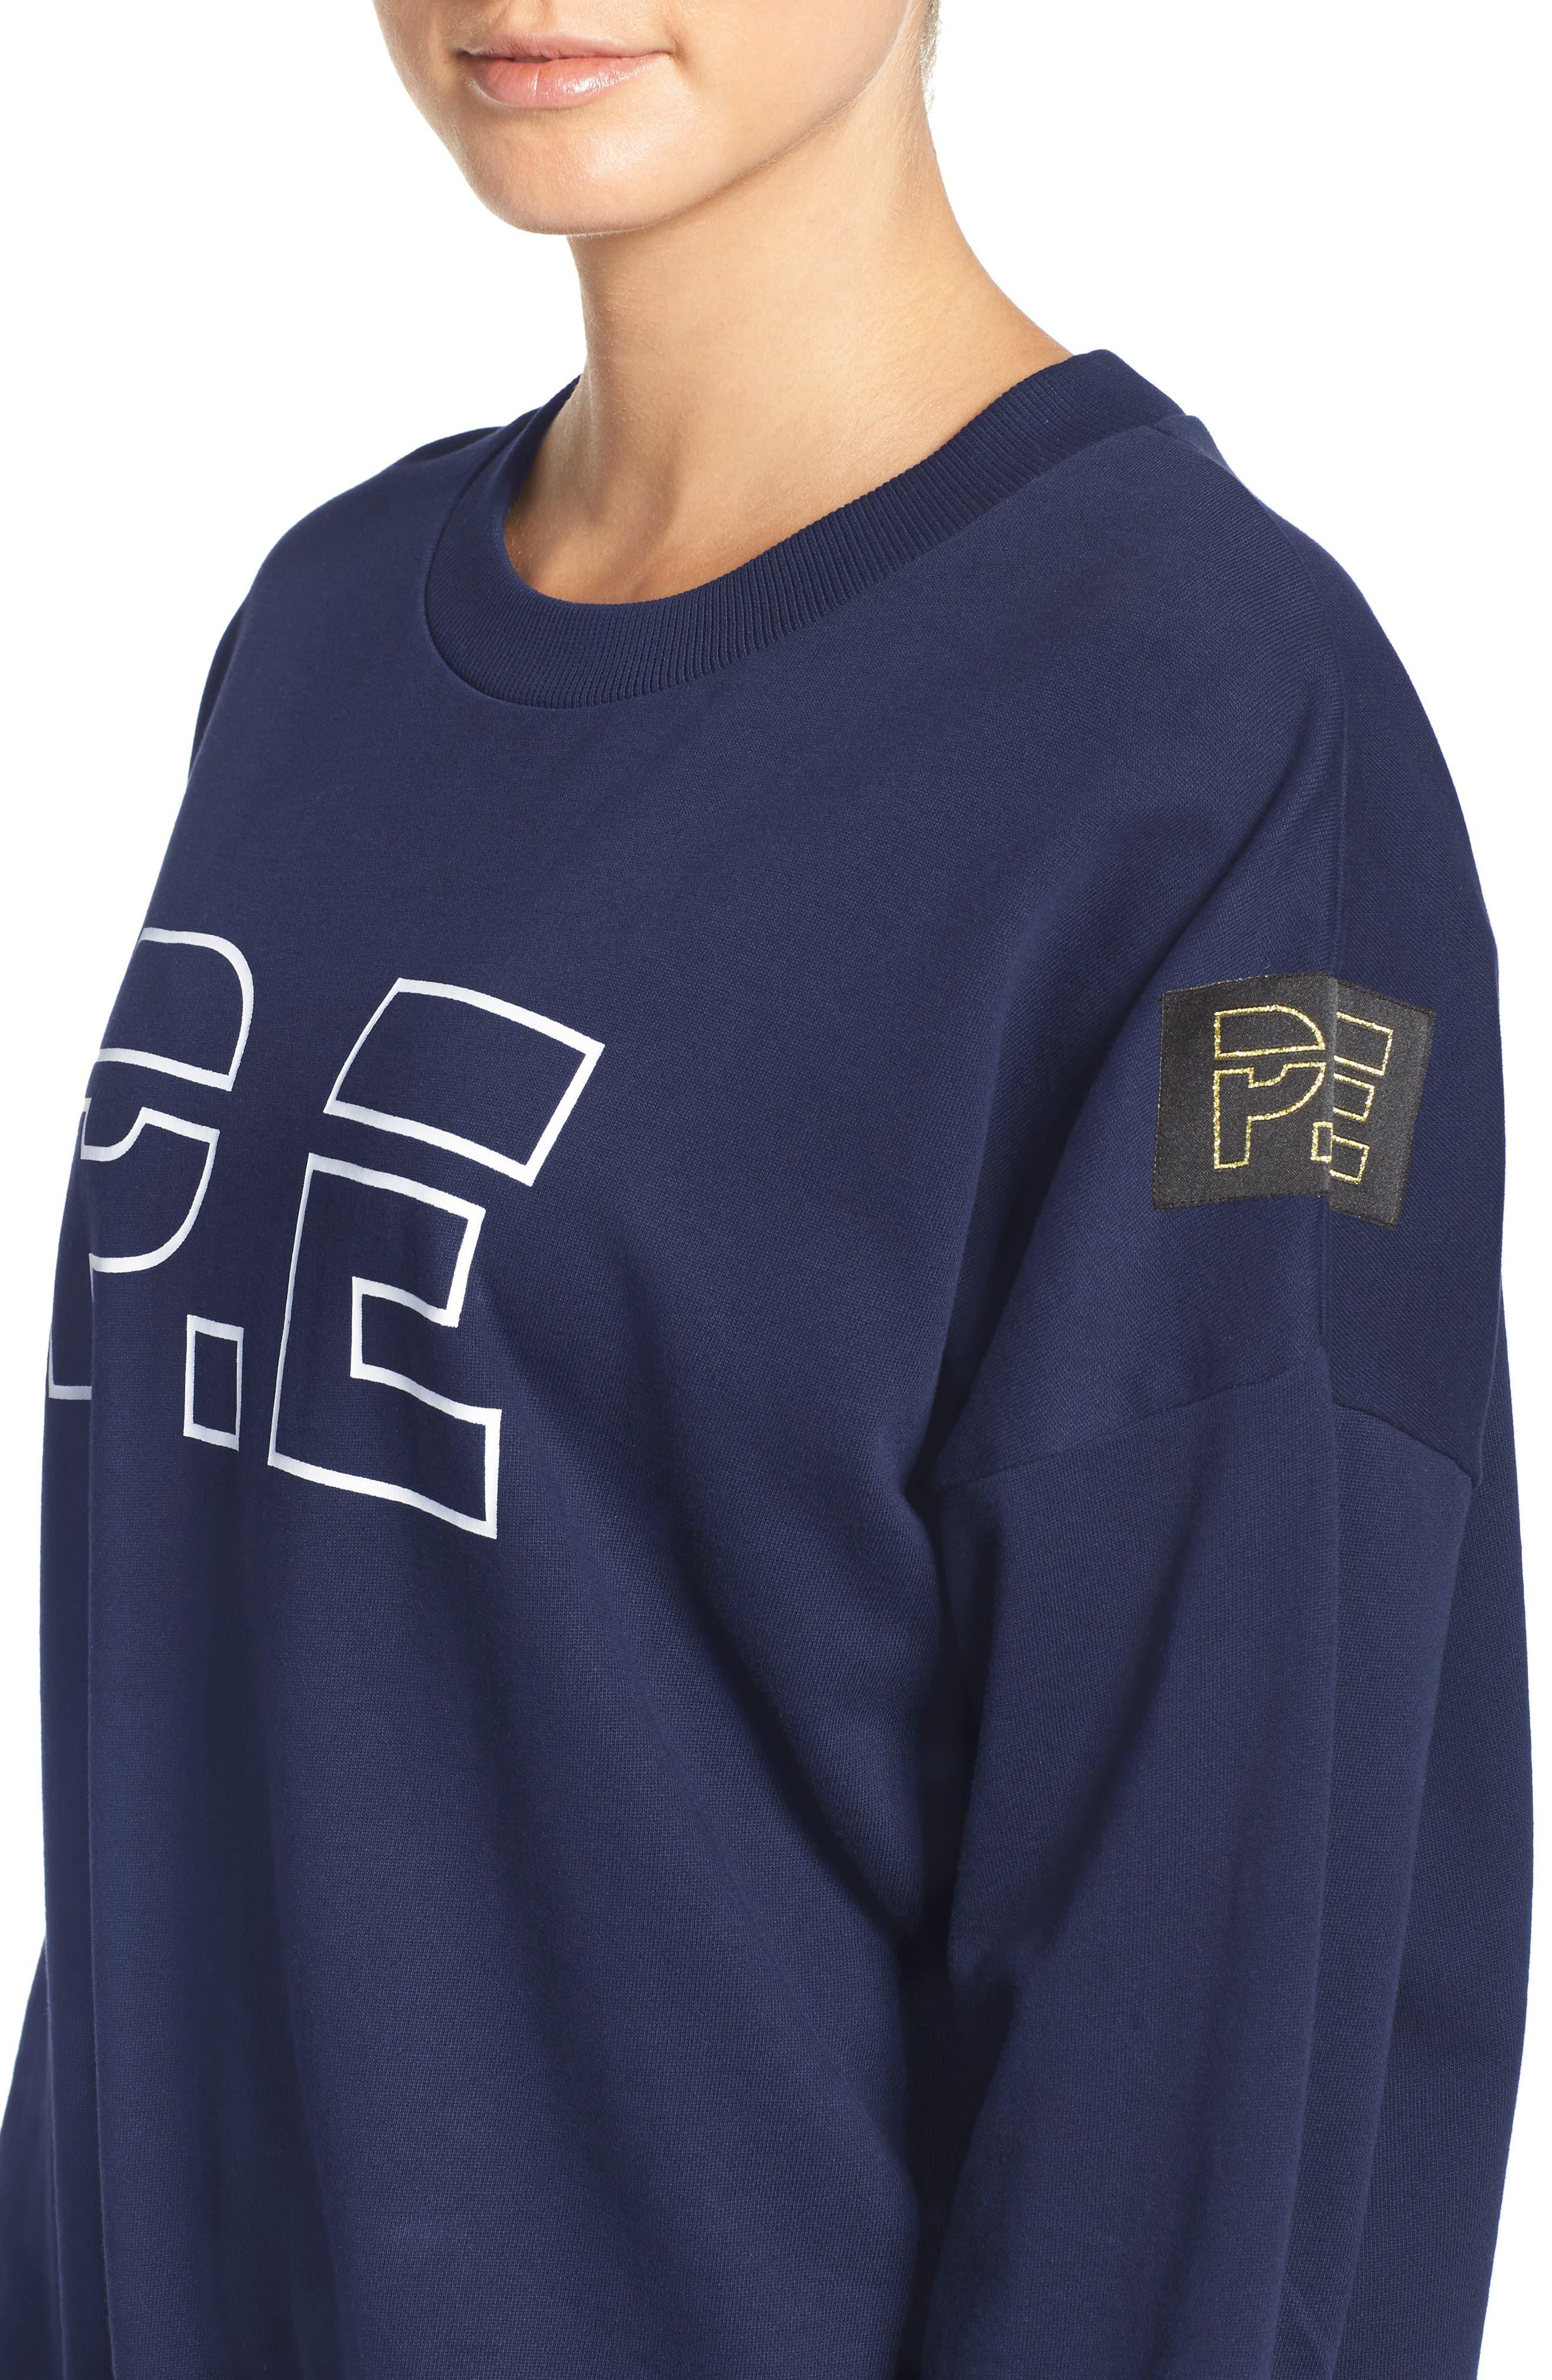 P.E. Nation The Heads Up Sweatshirt,                             Alternate thumbnail 4, color,                             Navy